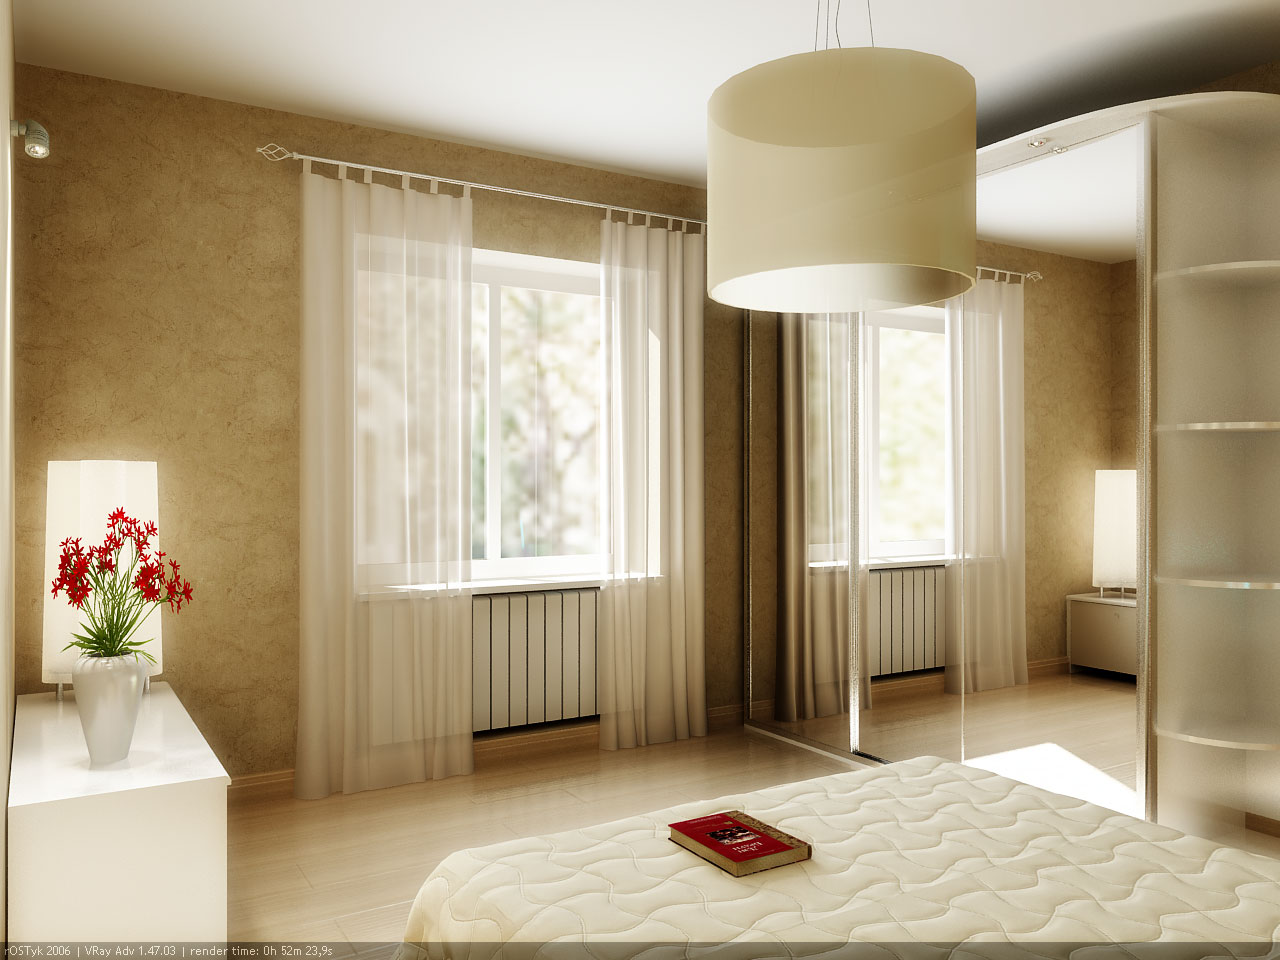 Home Interior Design Wallpapers HD Photo Galeries Best WallPaper 1280x960